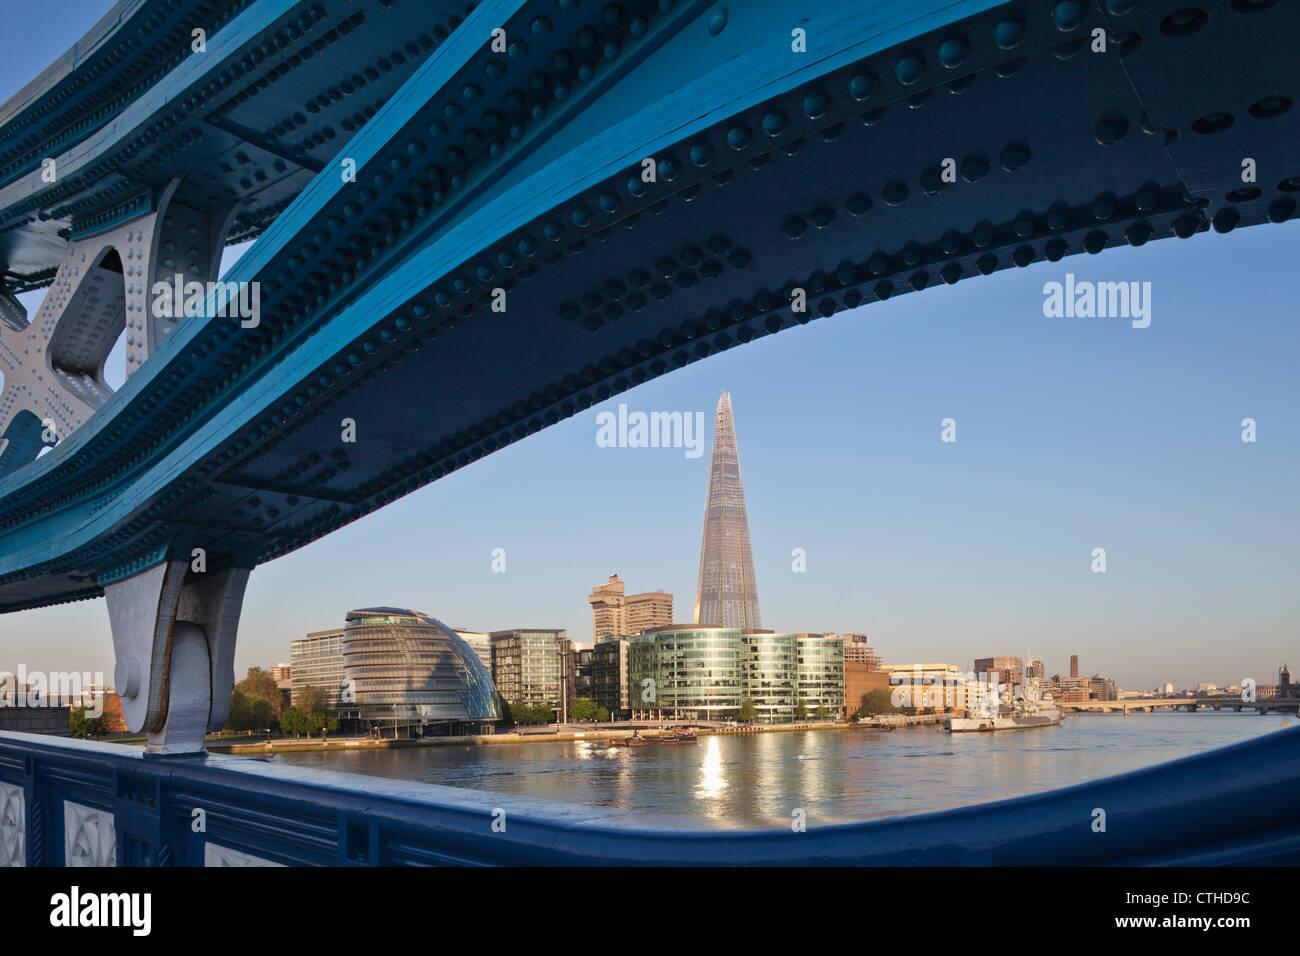 England, London, Southwark, Tower Bridge and The Shard Stock Photo